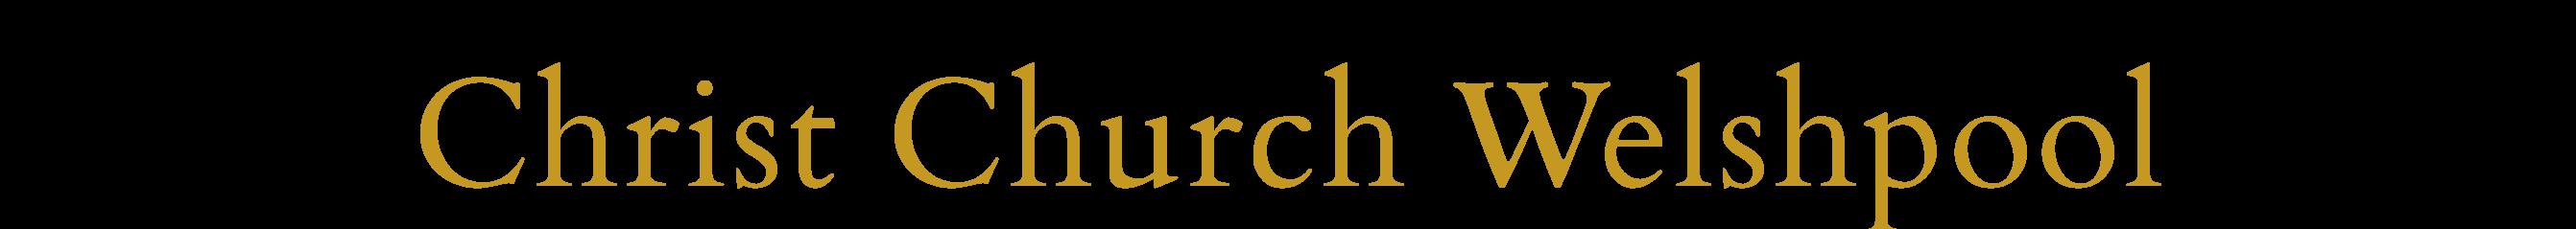 Christ Church Welshpool